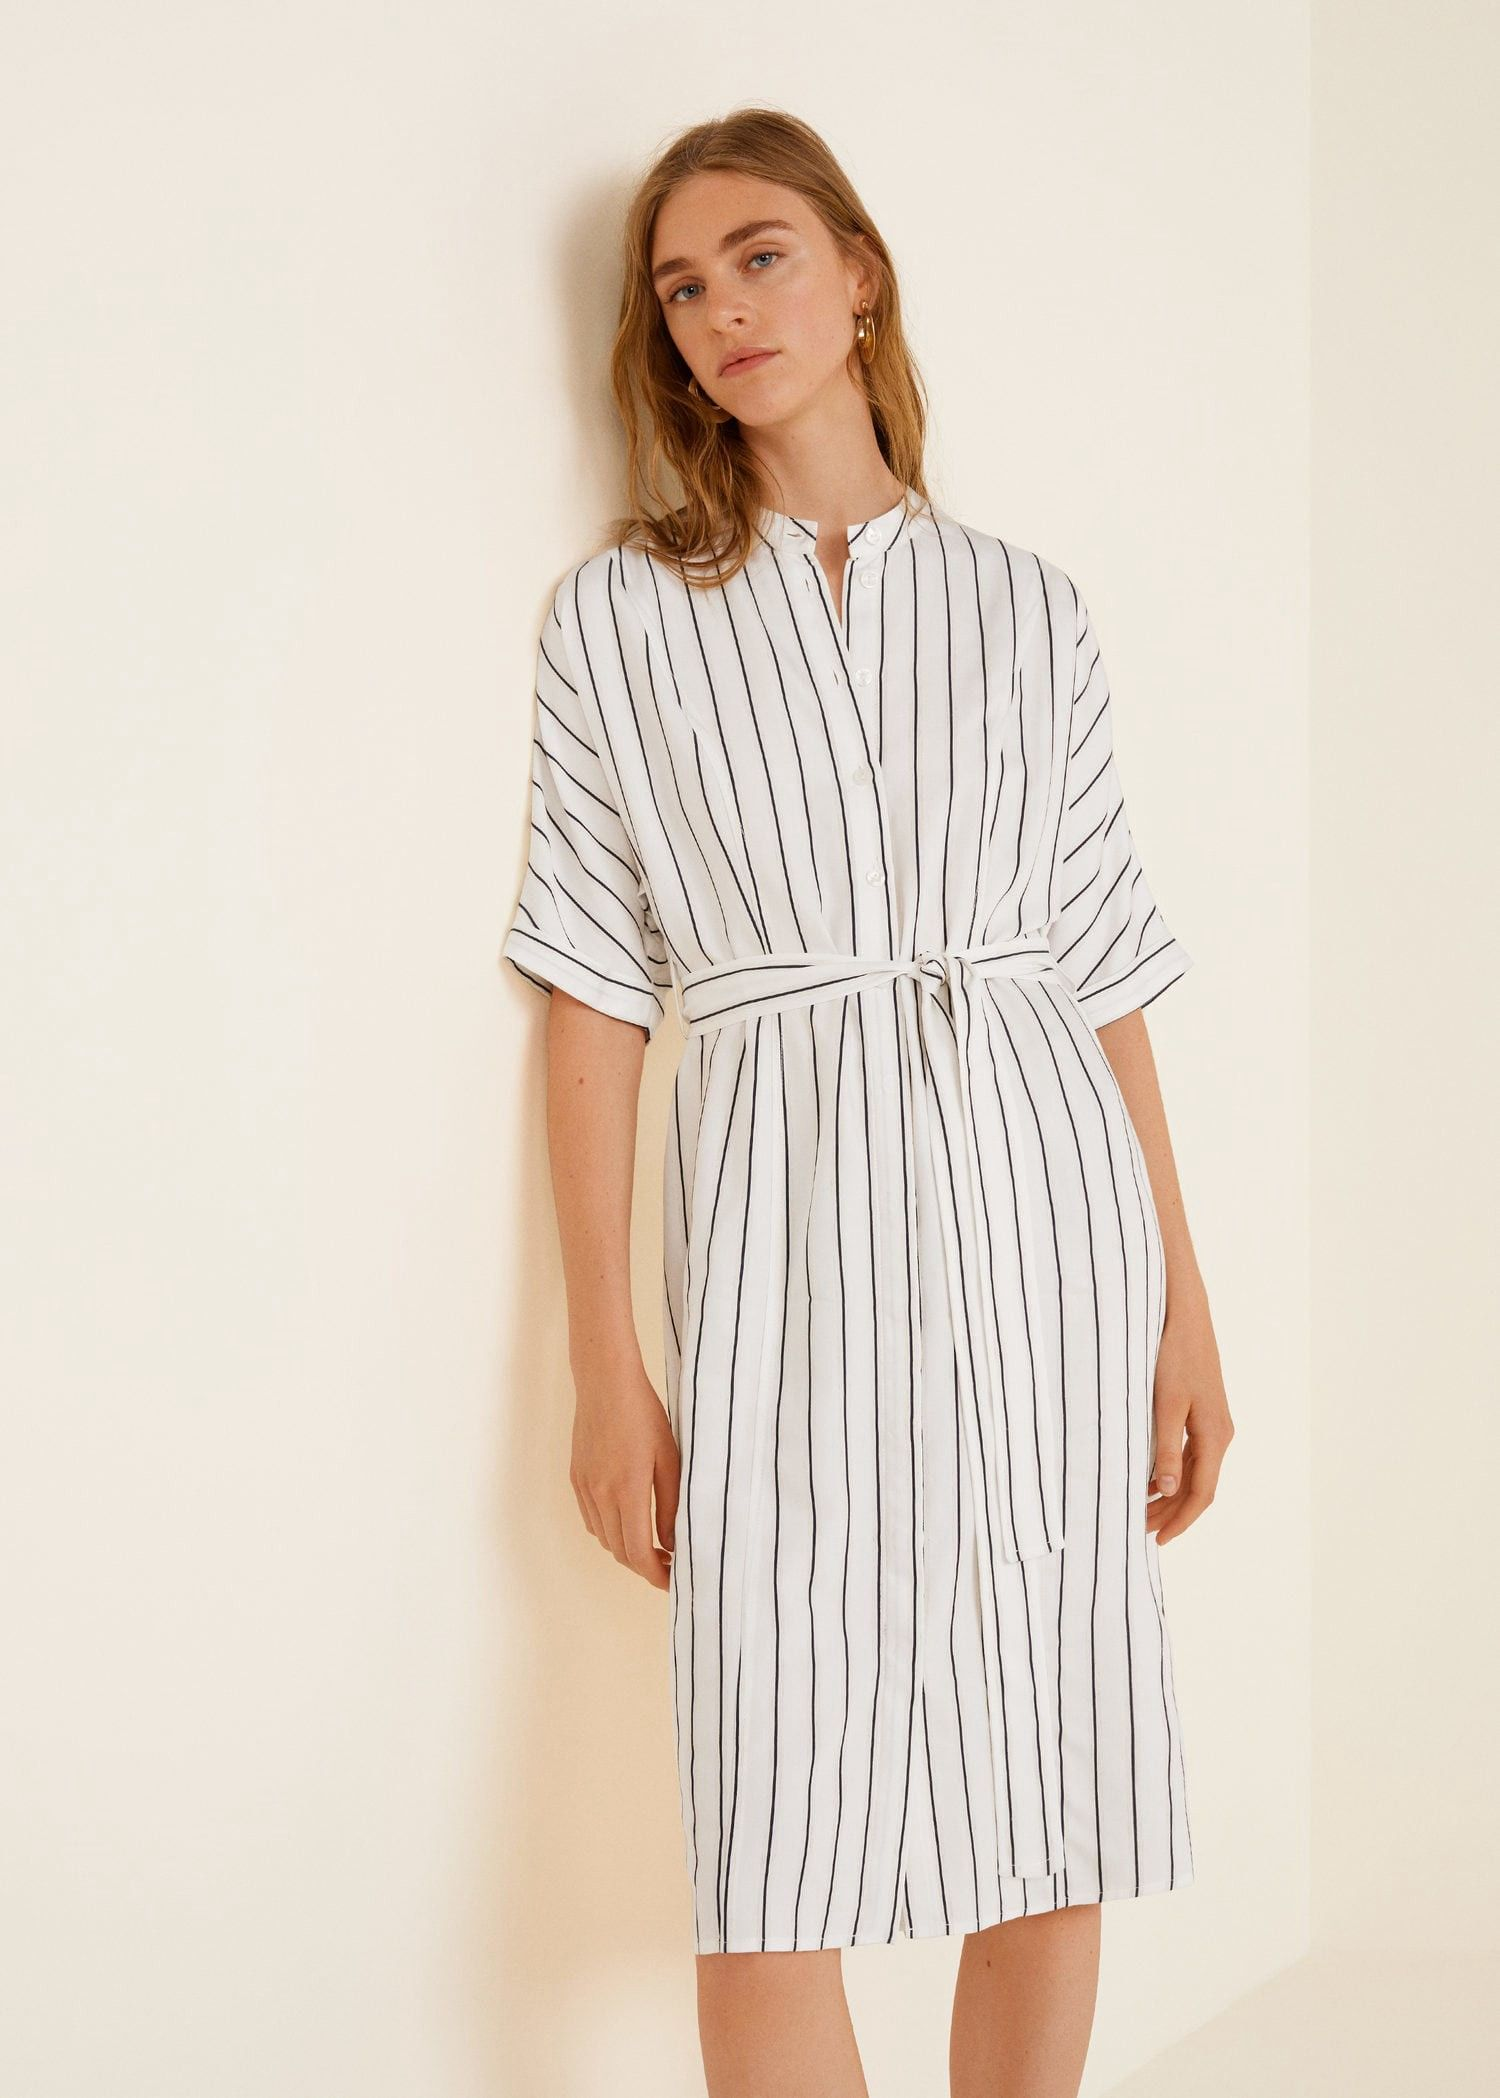 aa1dba4d595e Products Shirt Mango Dress Dress Striped By 7IZwTvv